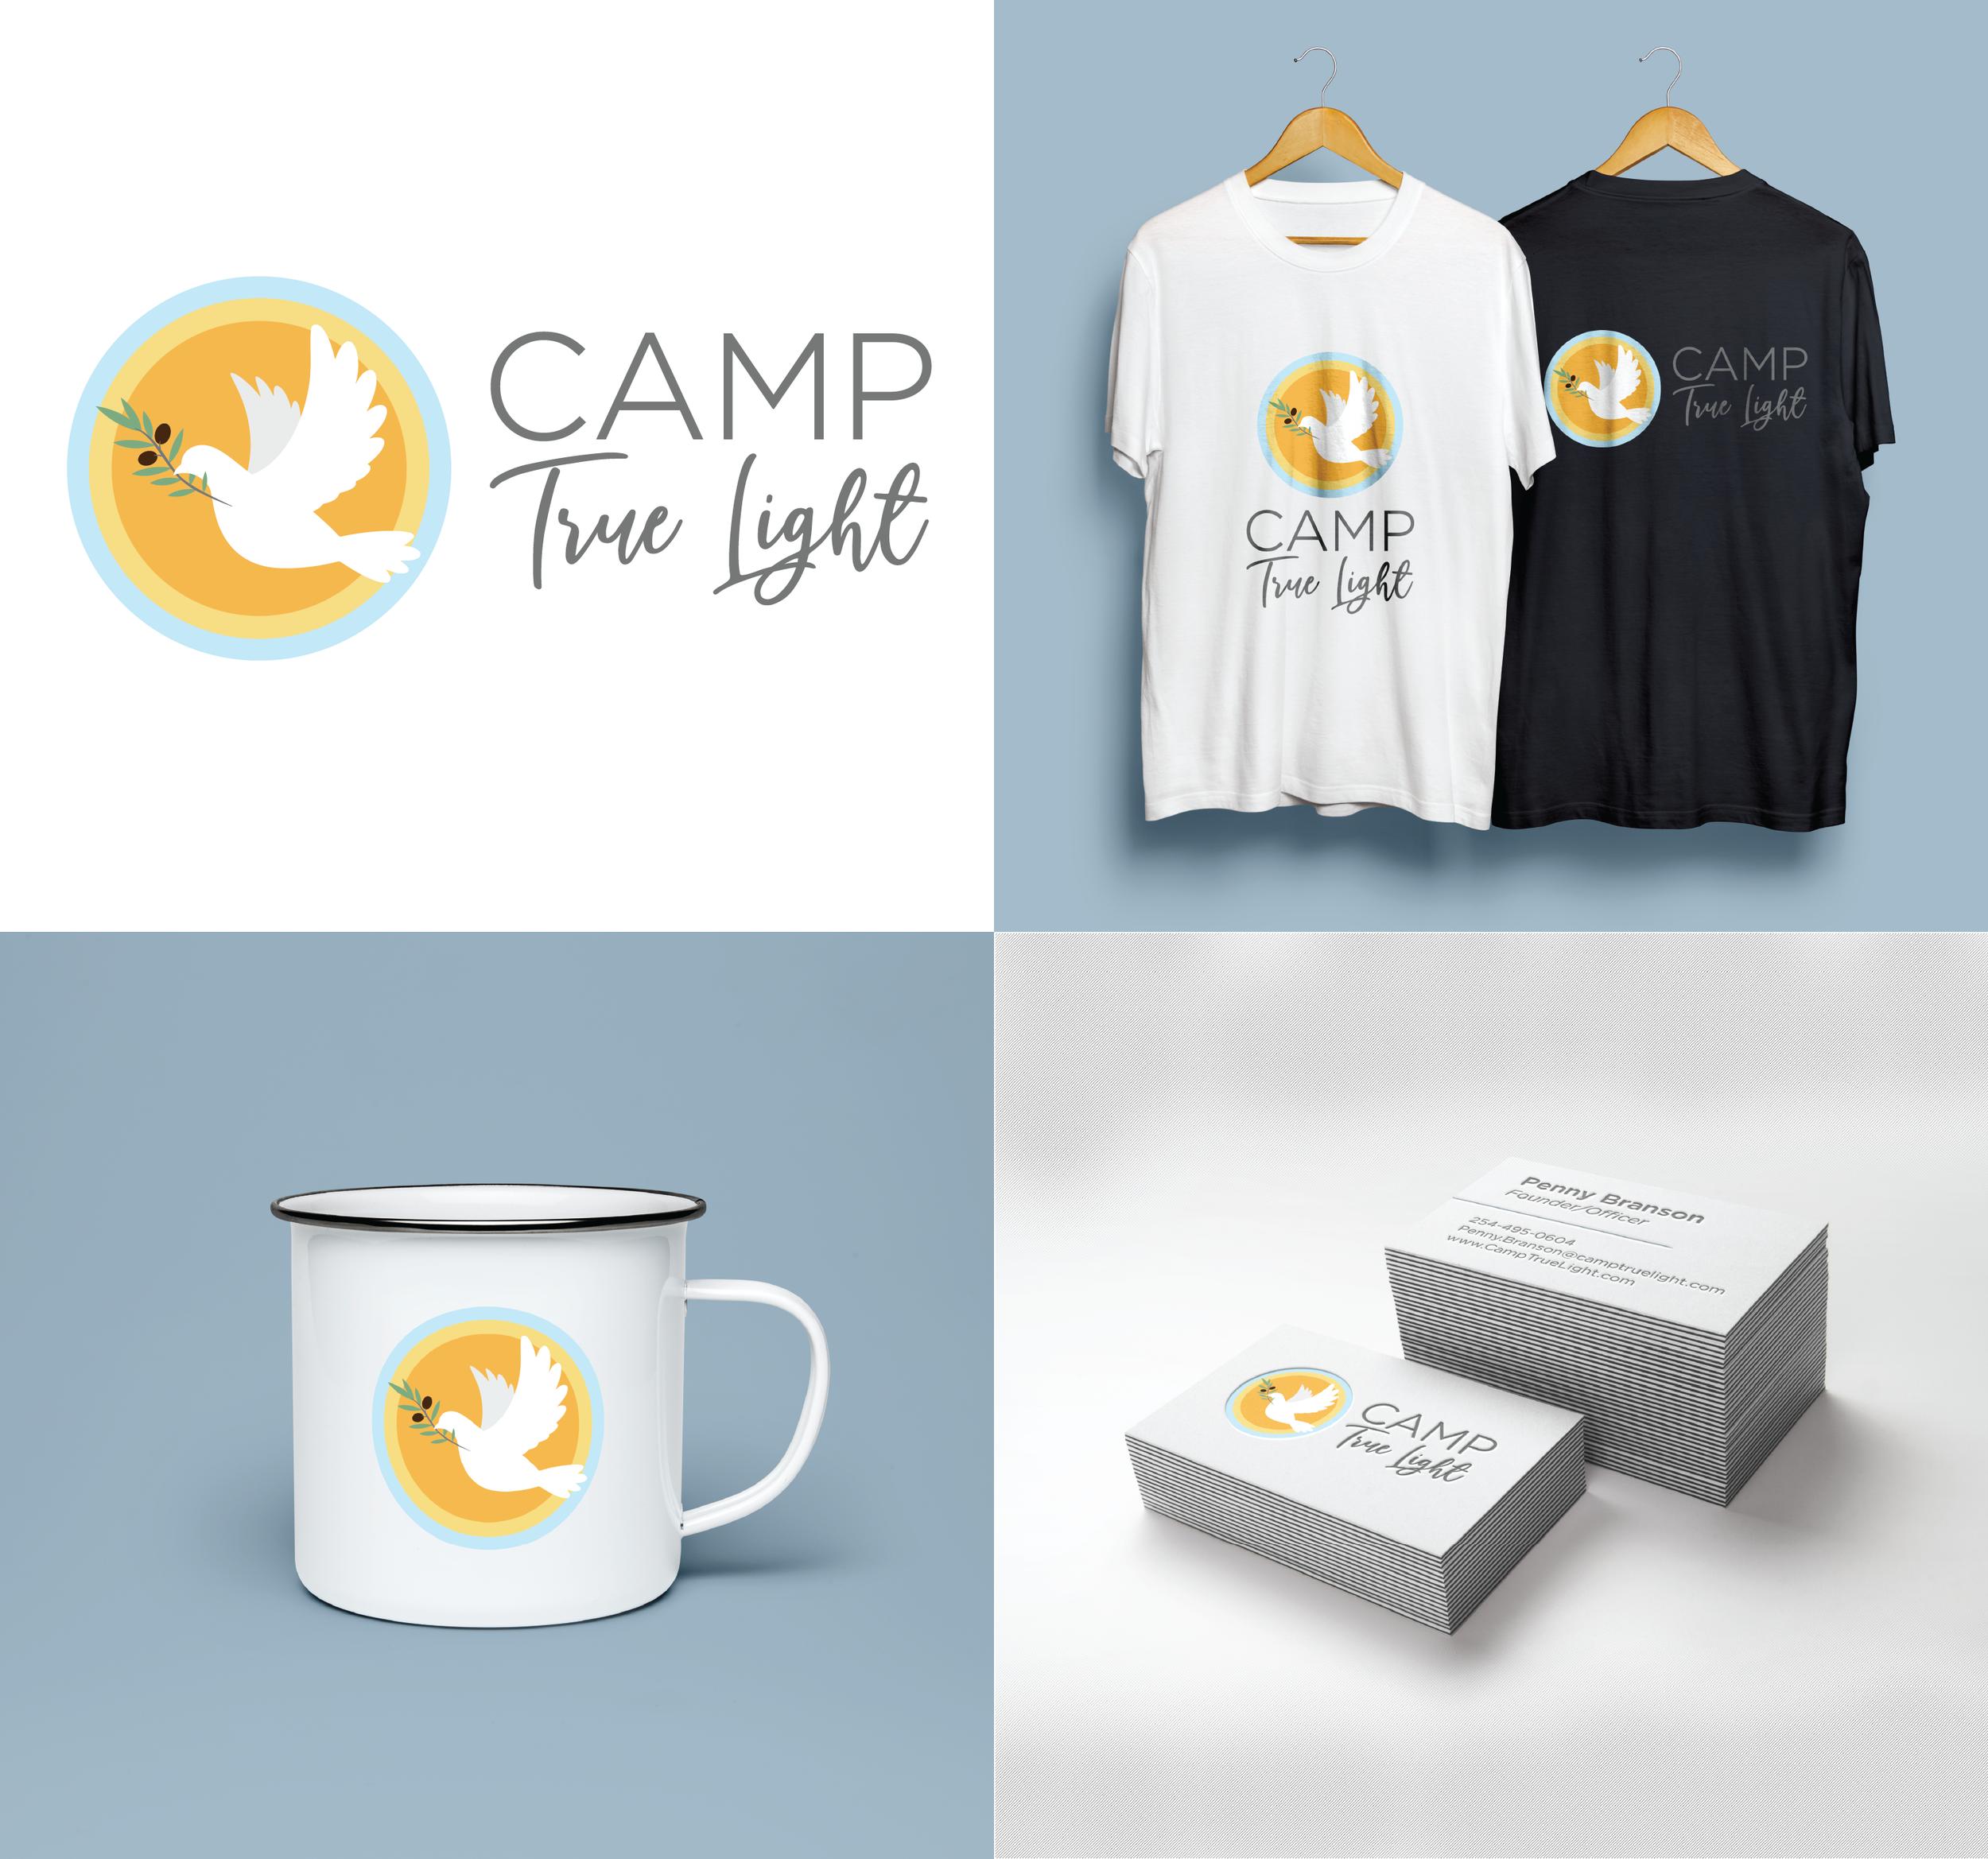 Camp True Light Branding